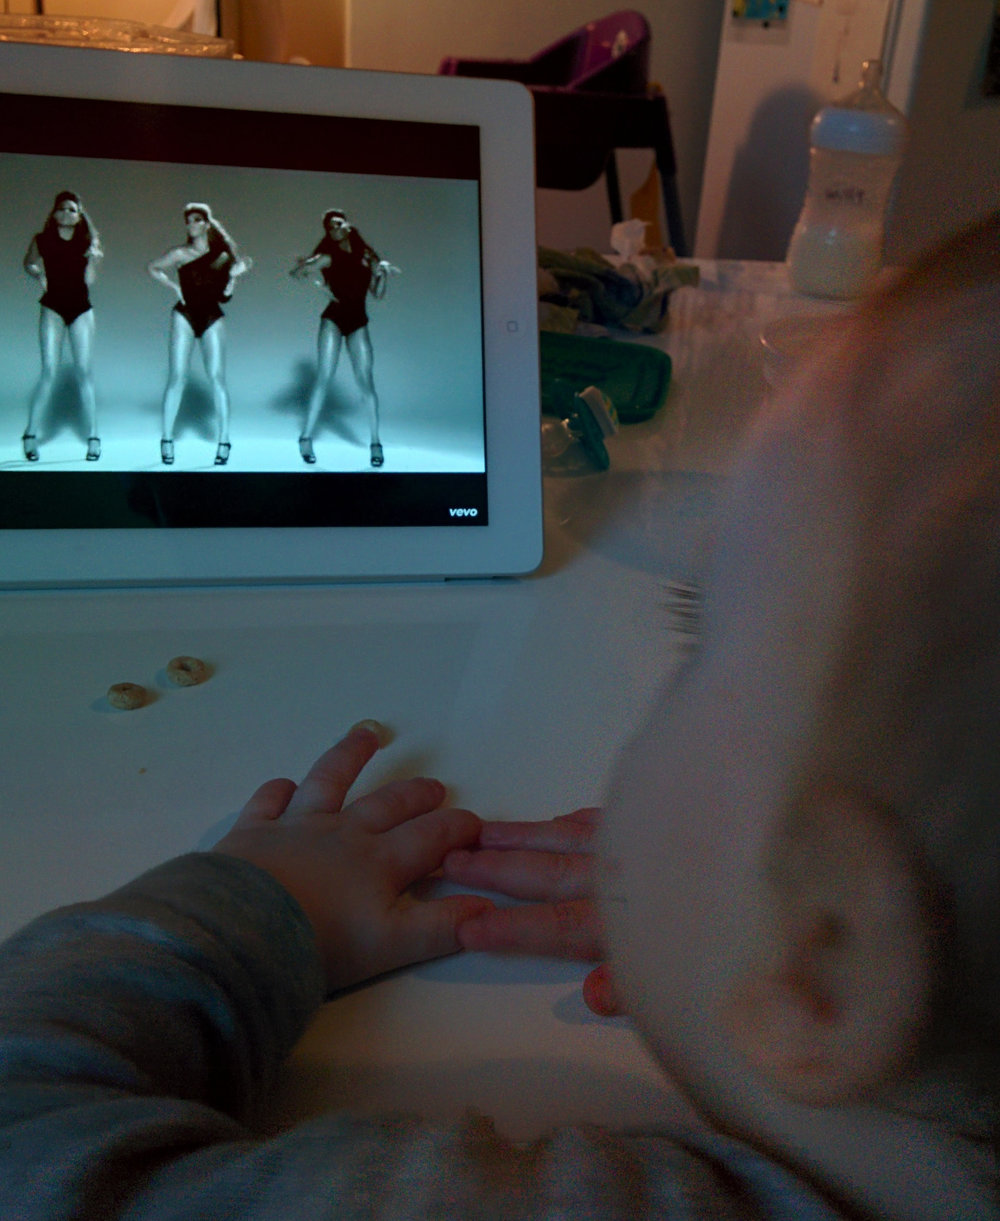 B watching B.jpg